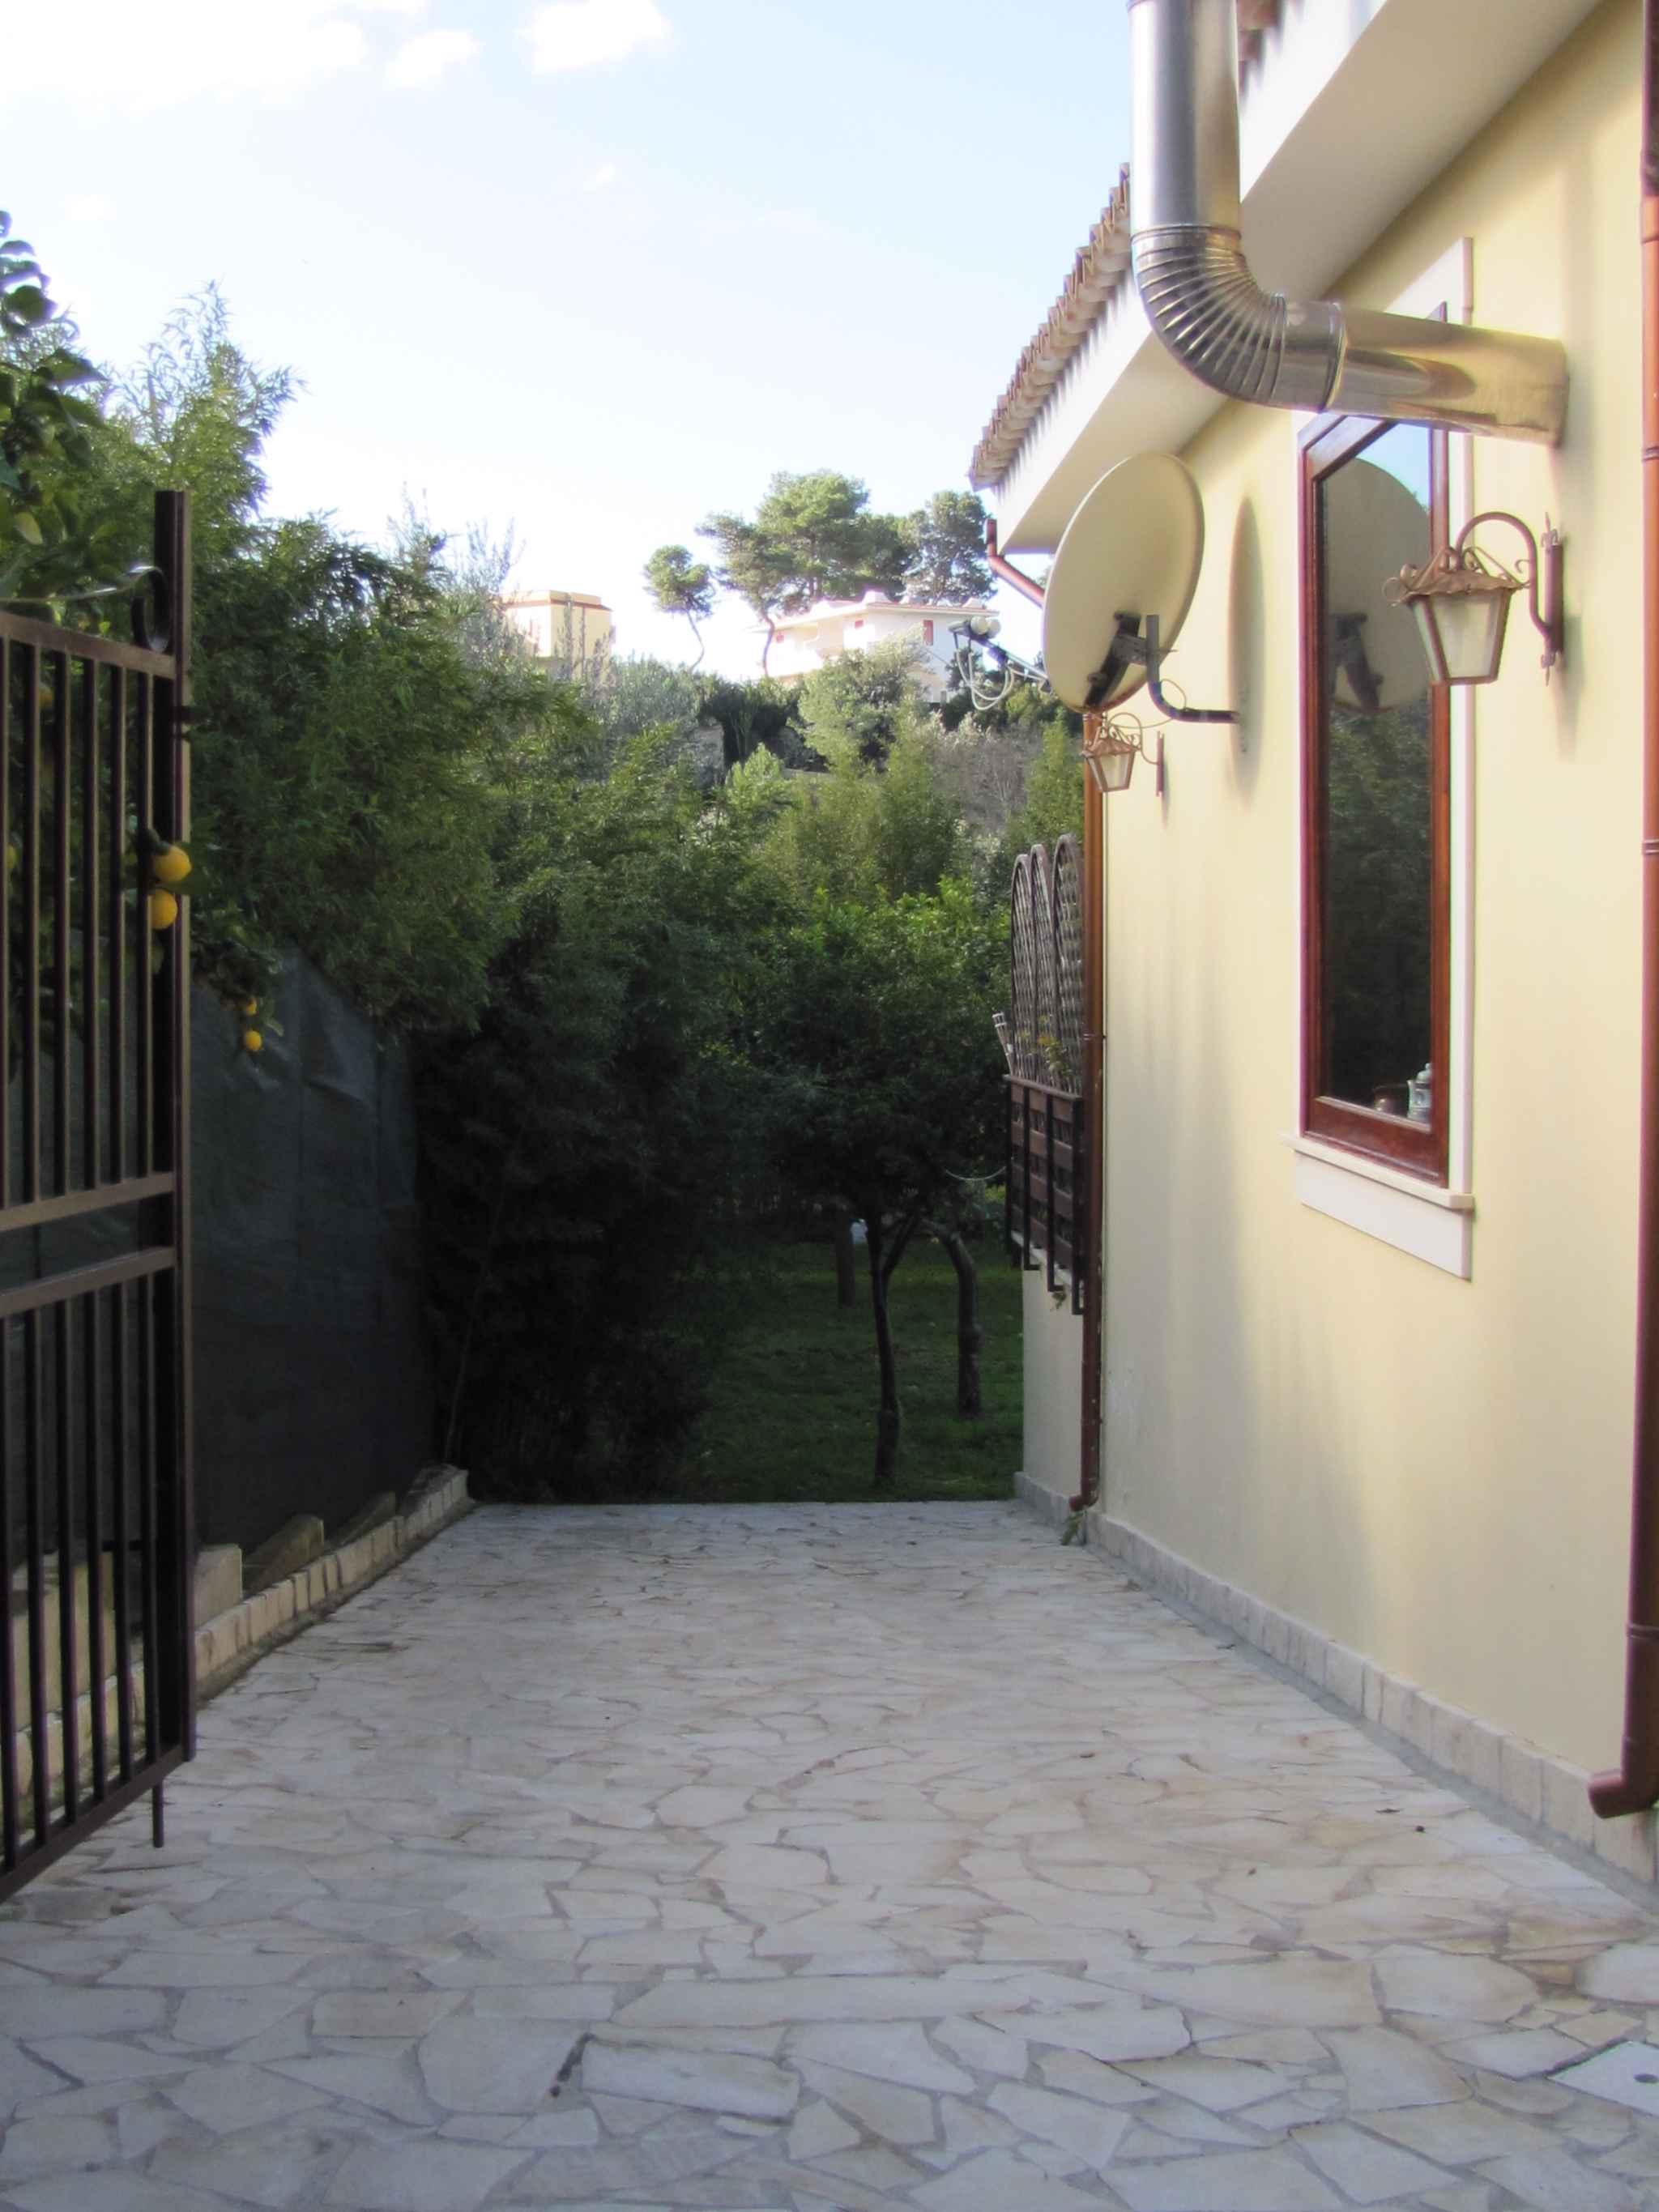 Maison de vacances mit Blick auf Zitronengarten (317534), Lido di Noto, Siracusa, Sicile, Italie, image 3